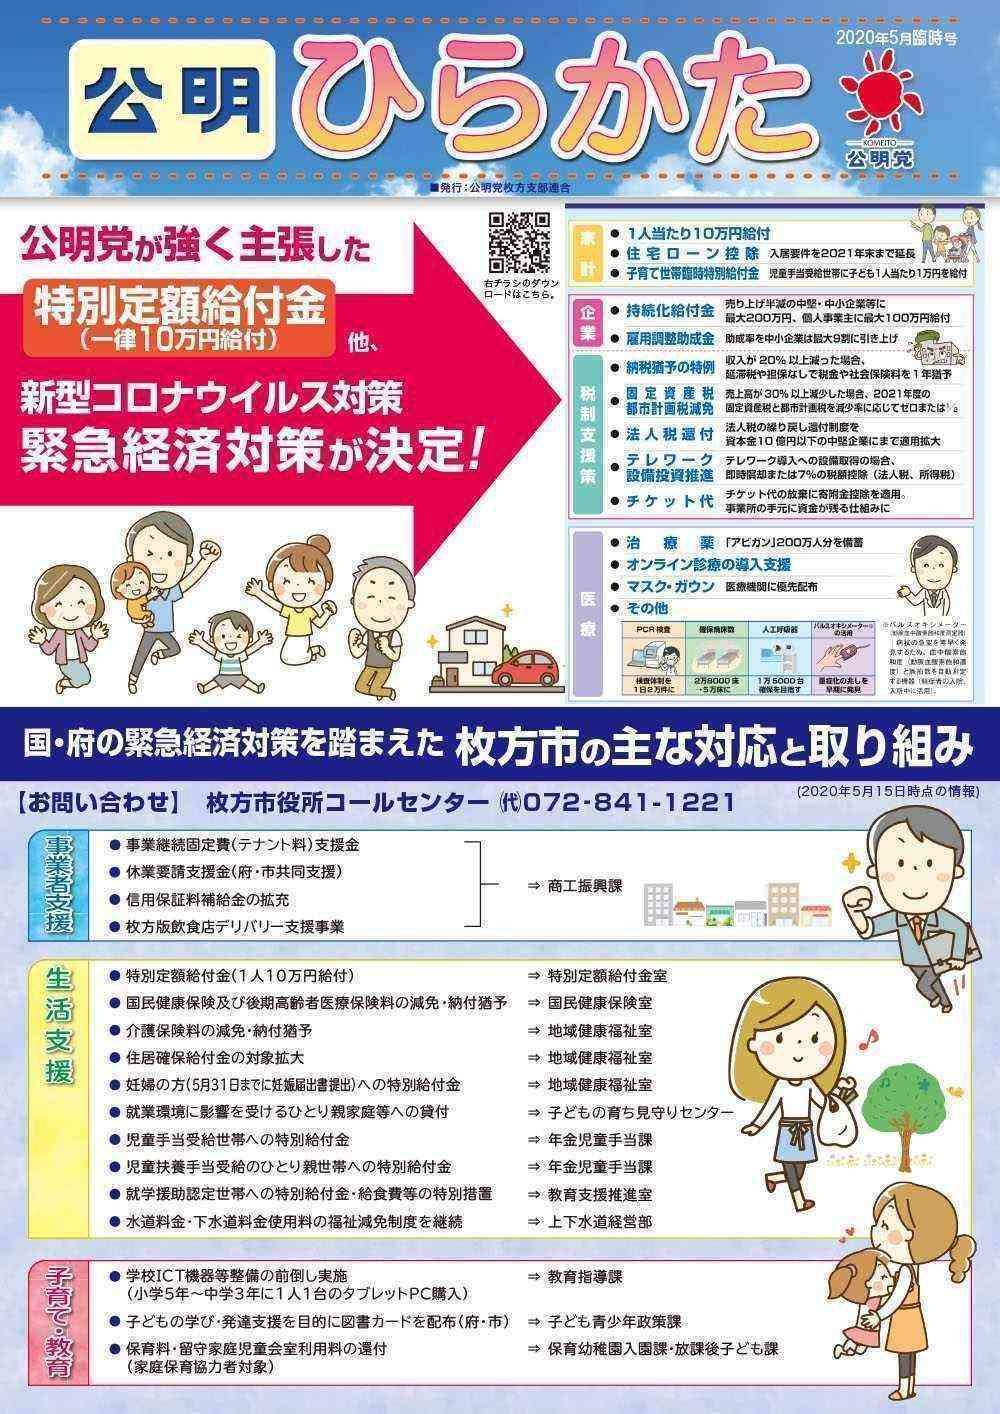 20200511-2_komei-hirakata_B4